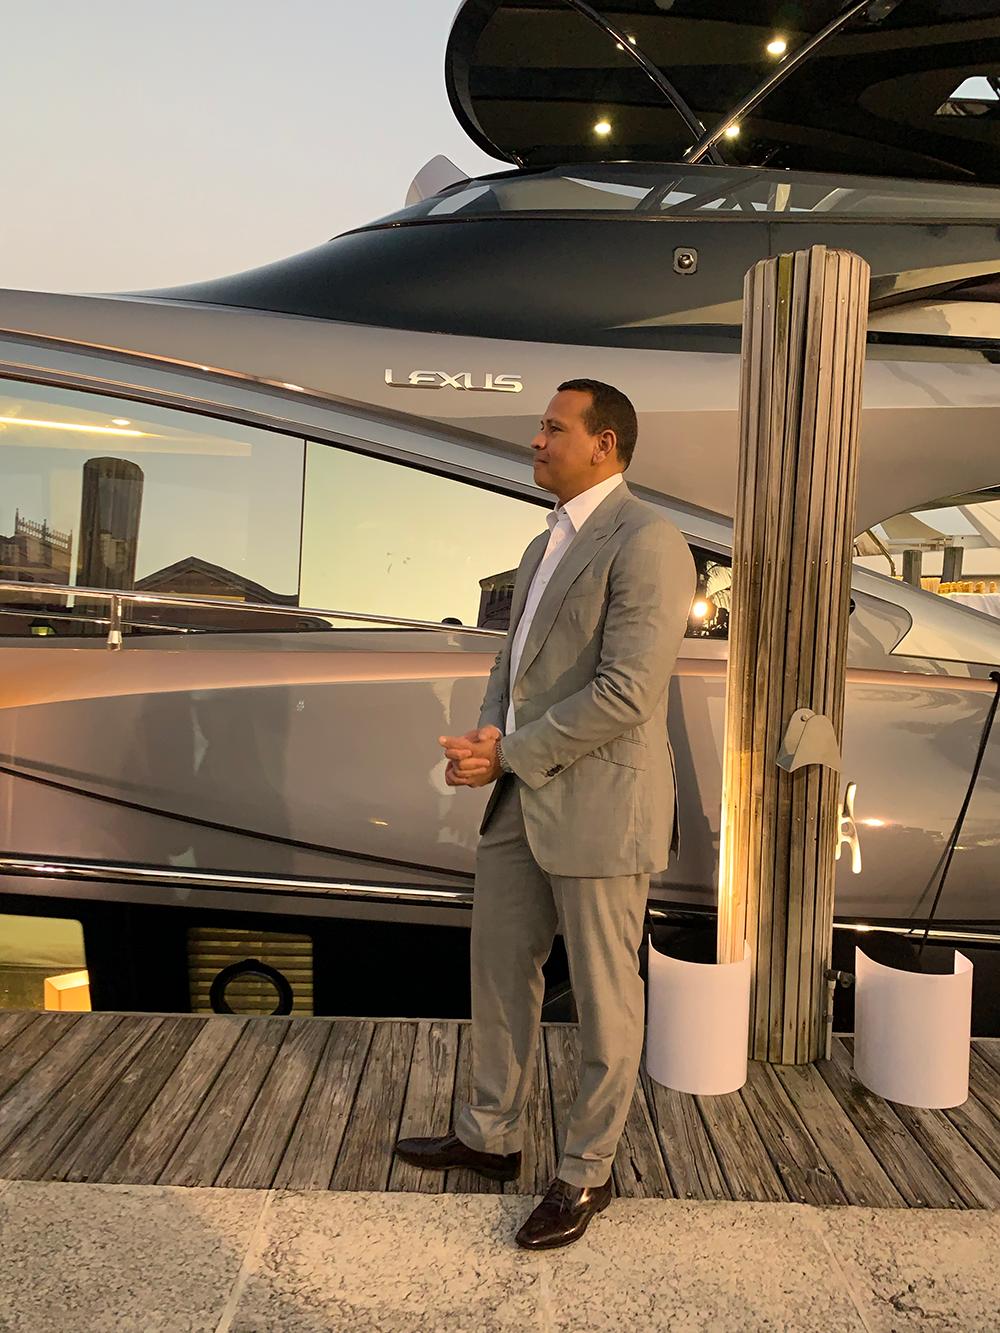 Arod Lexus LY 650 Yacht